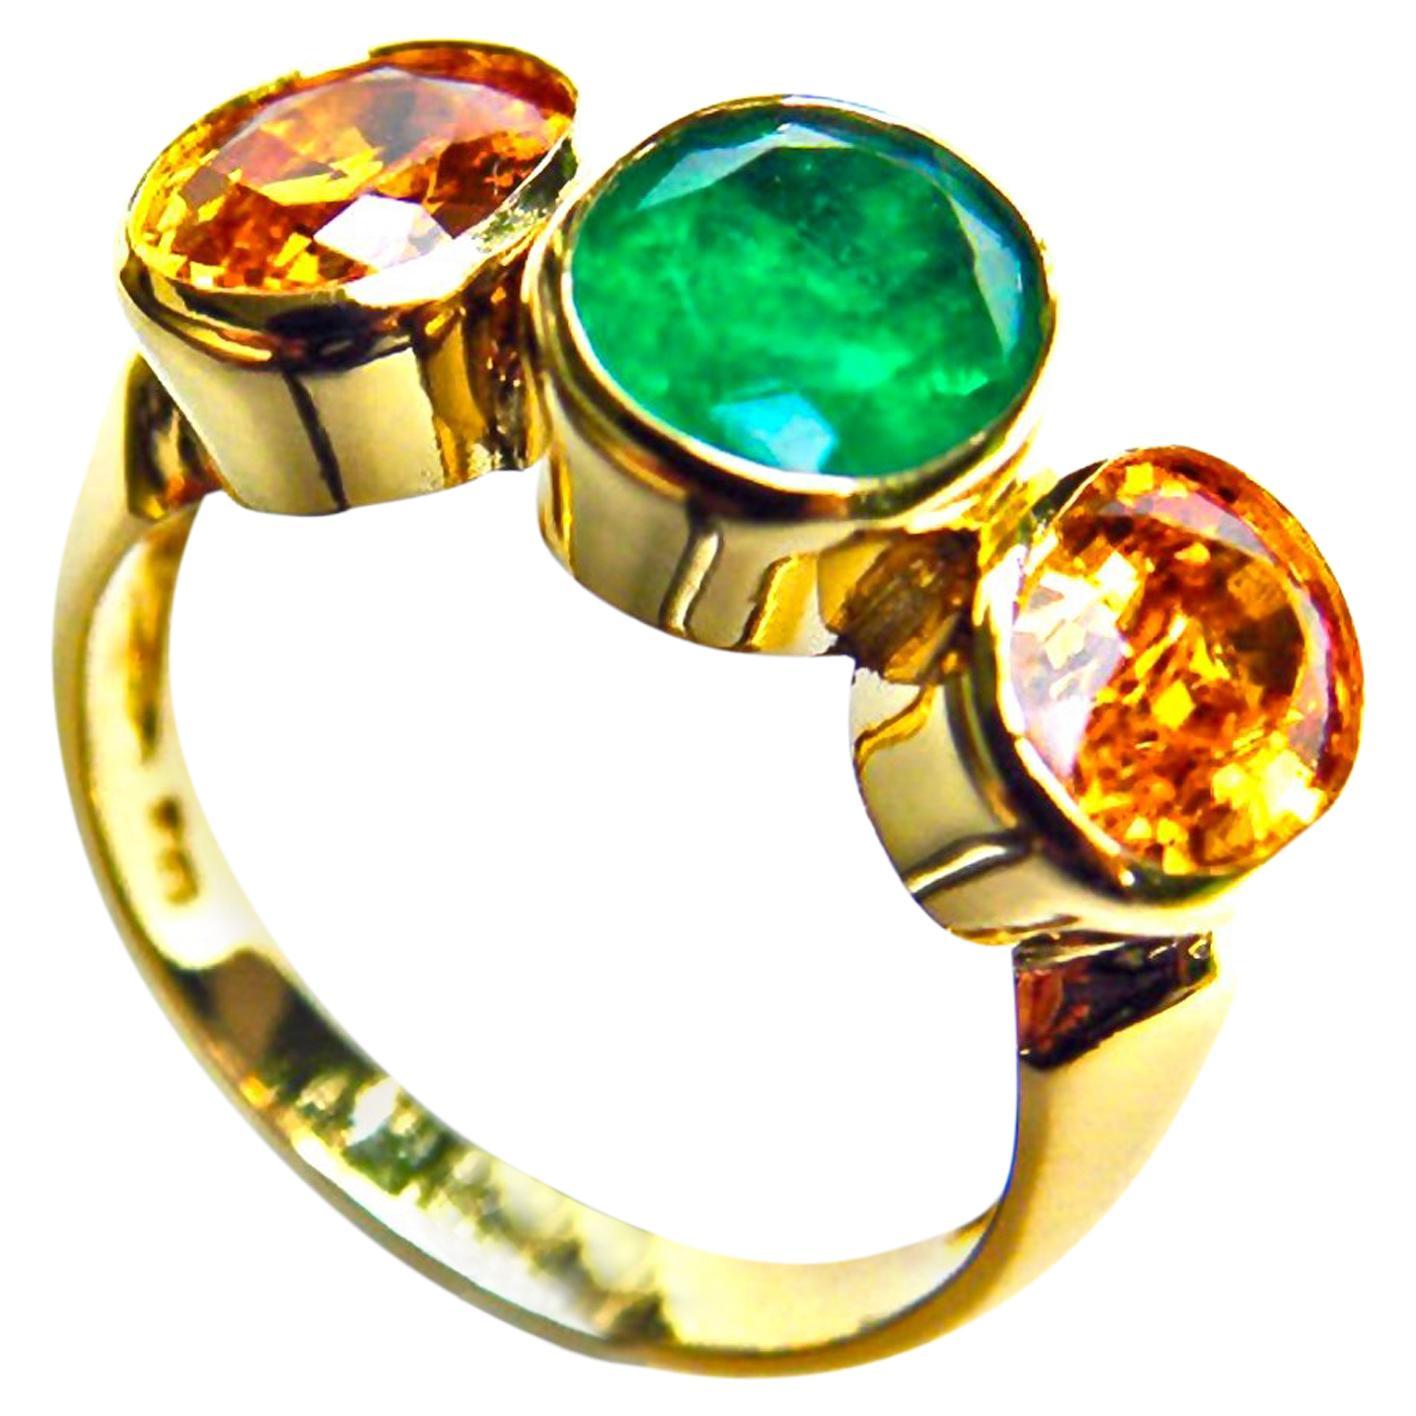 Sapphire and Emerald Three Stone Ring 18 Karat Gold